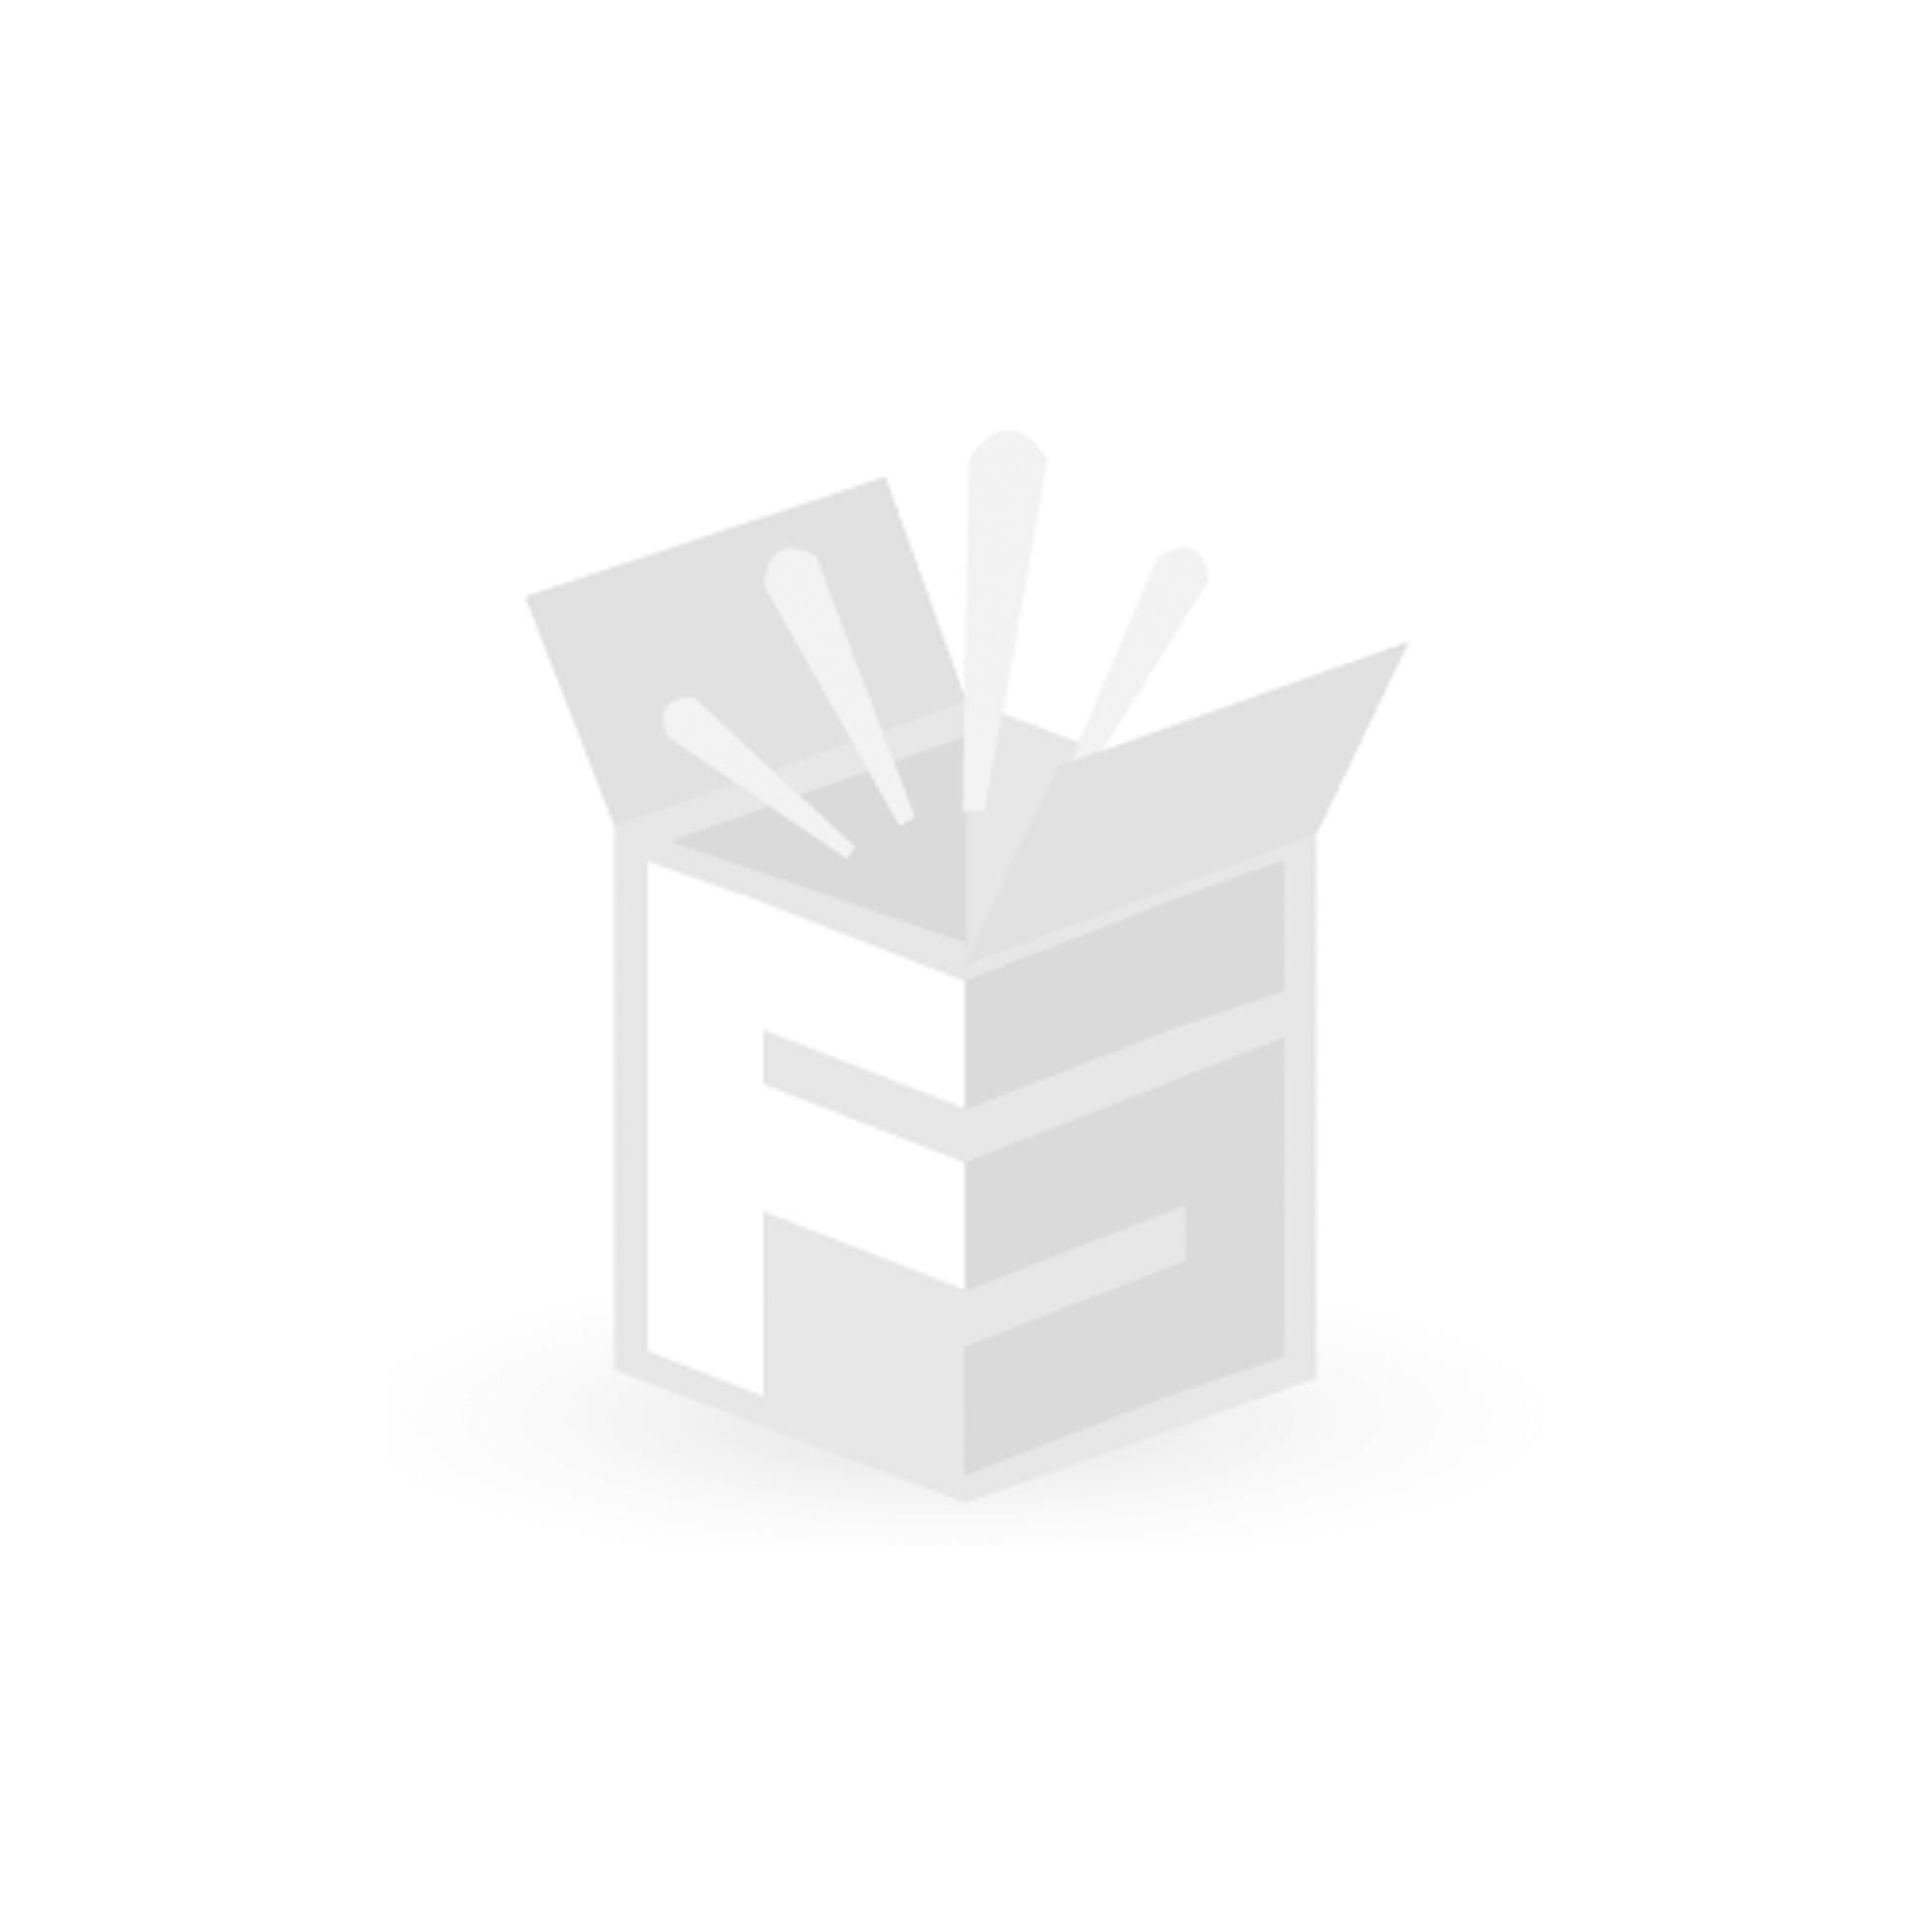 Kibernetik Kupplung 1x CEE32A, 5-polig